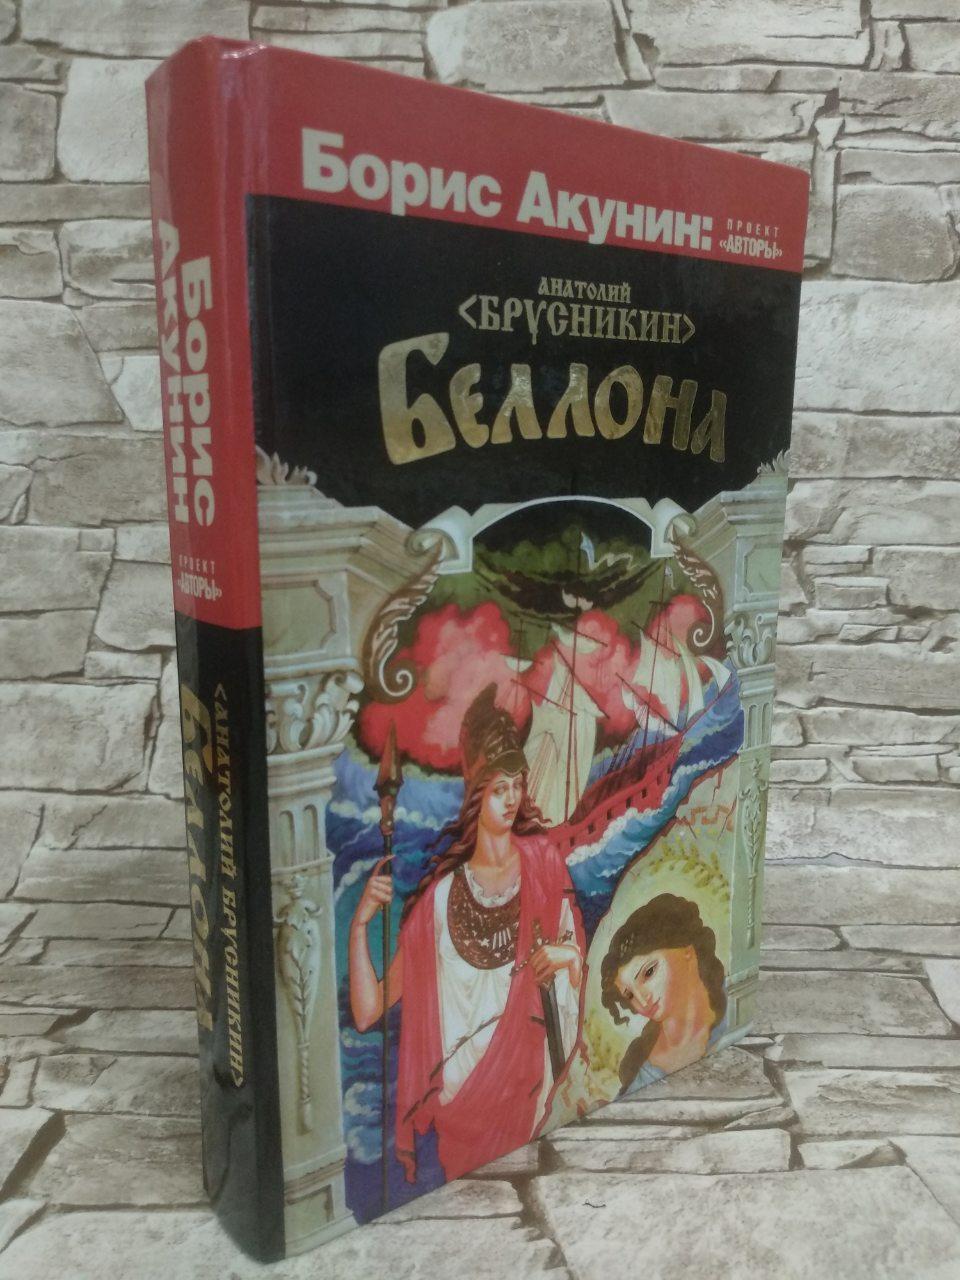 Книга  «Беллона»  Бориса Акунина, Анатолий Брусникин (тв)